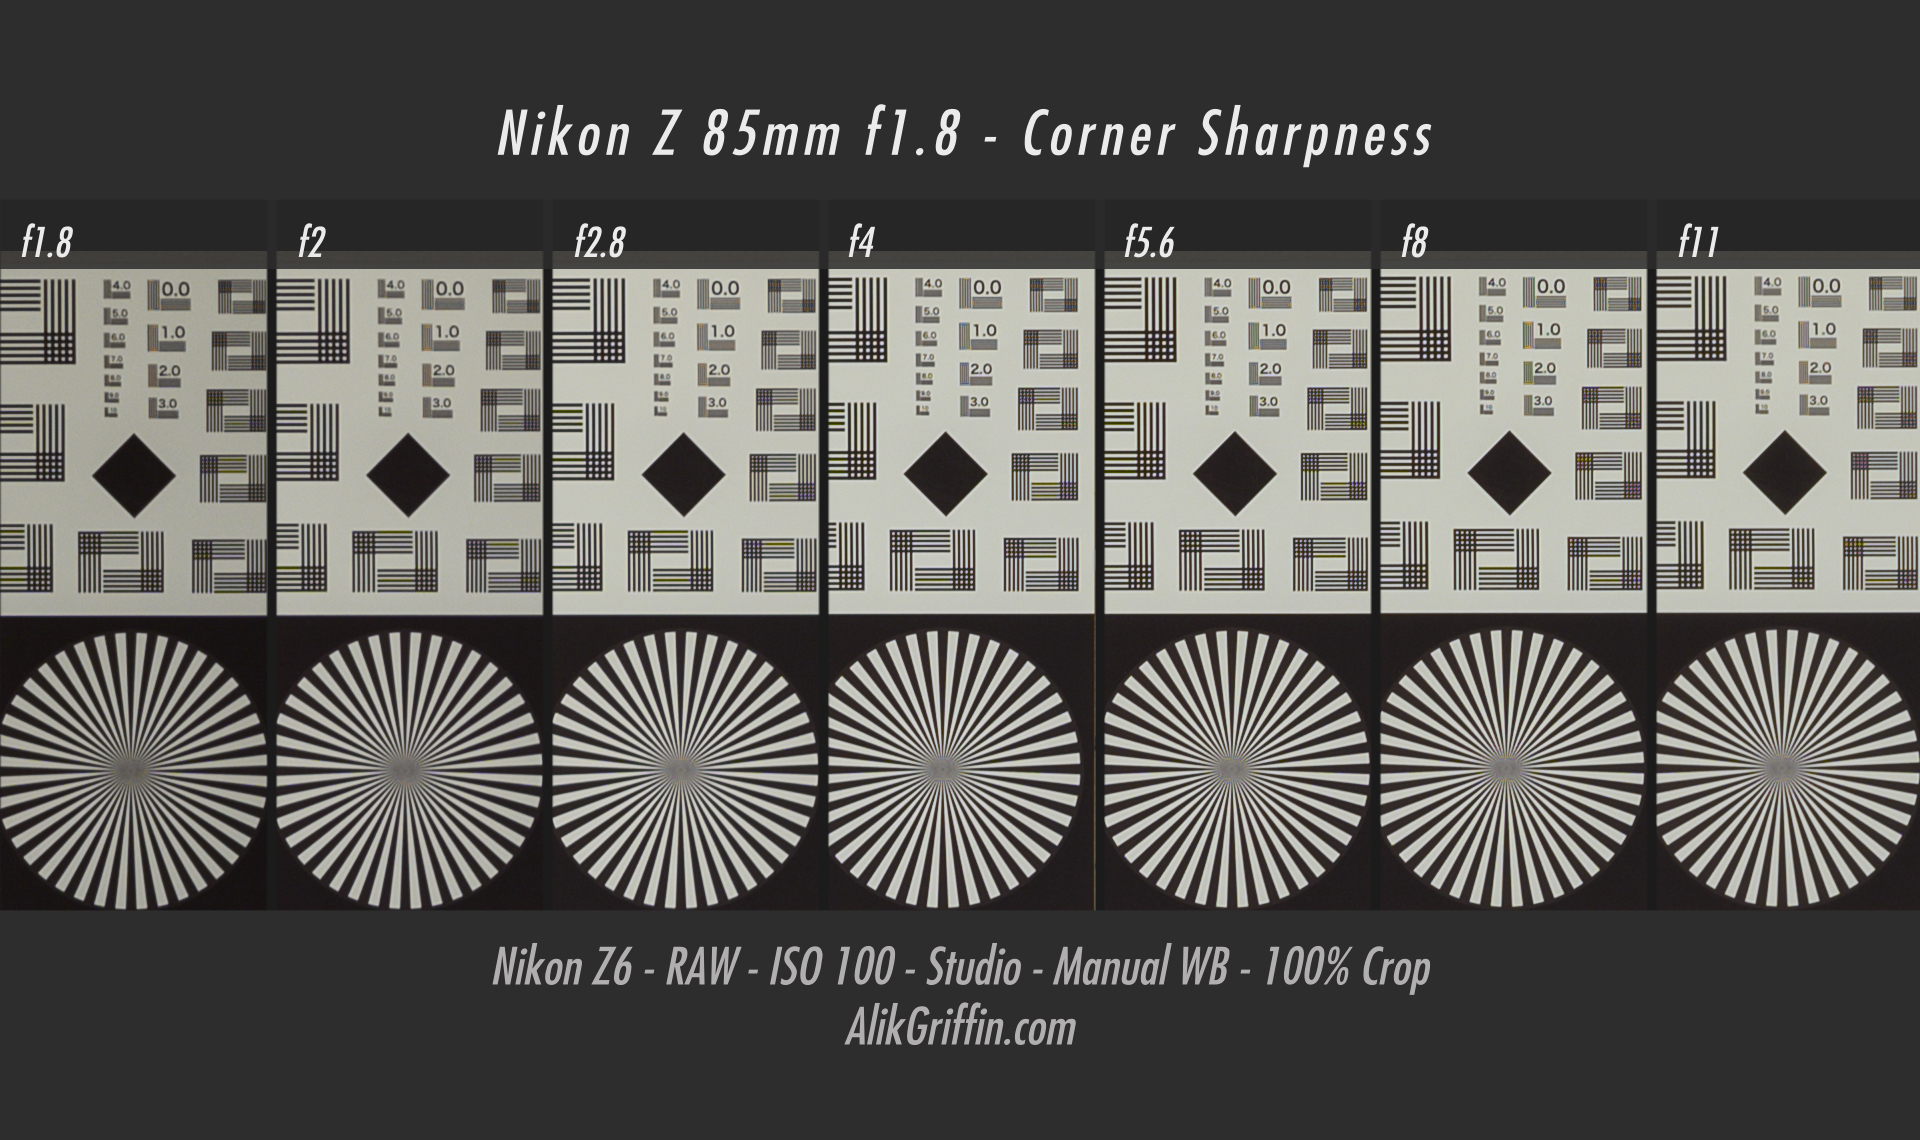 Nikon Z 85mm f1.8 S Corner Sharpness